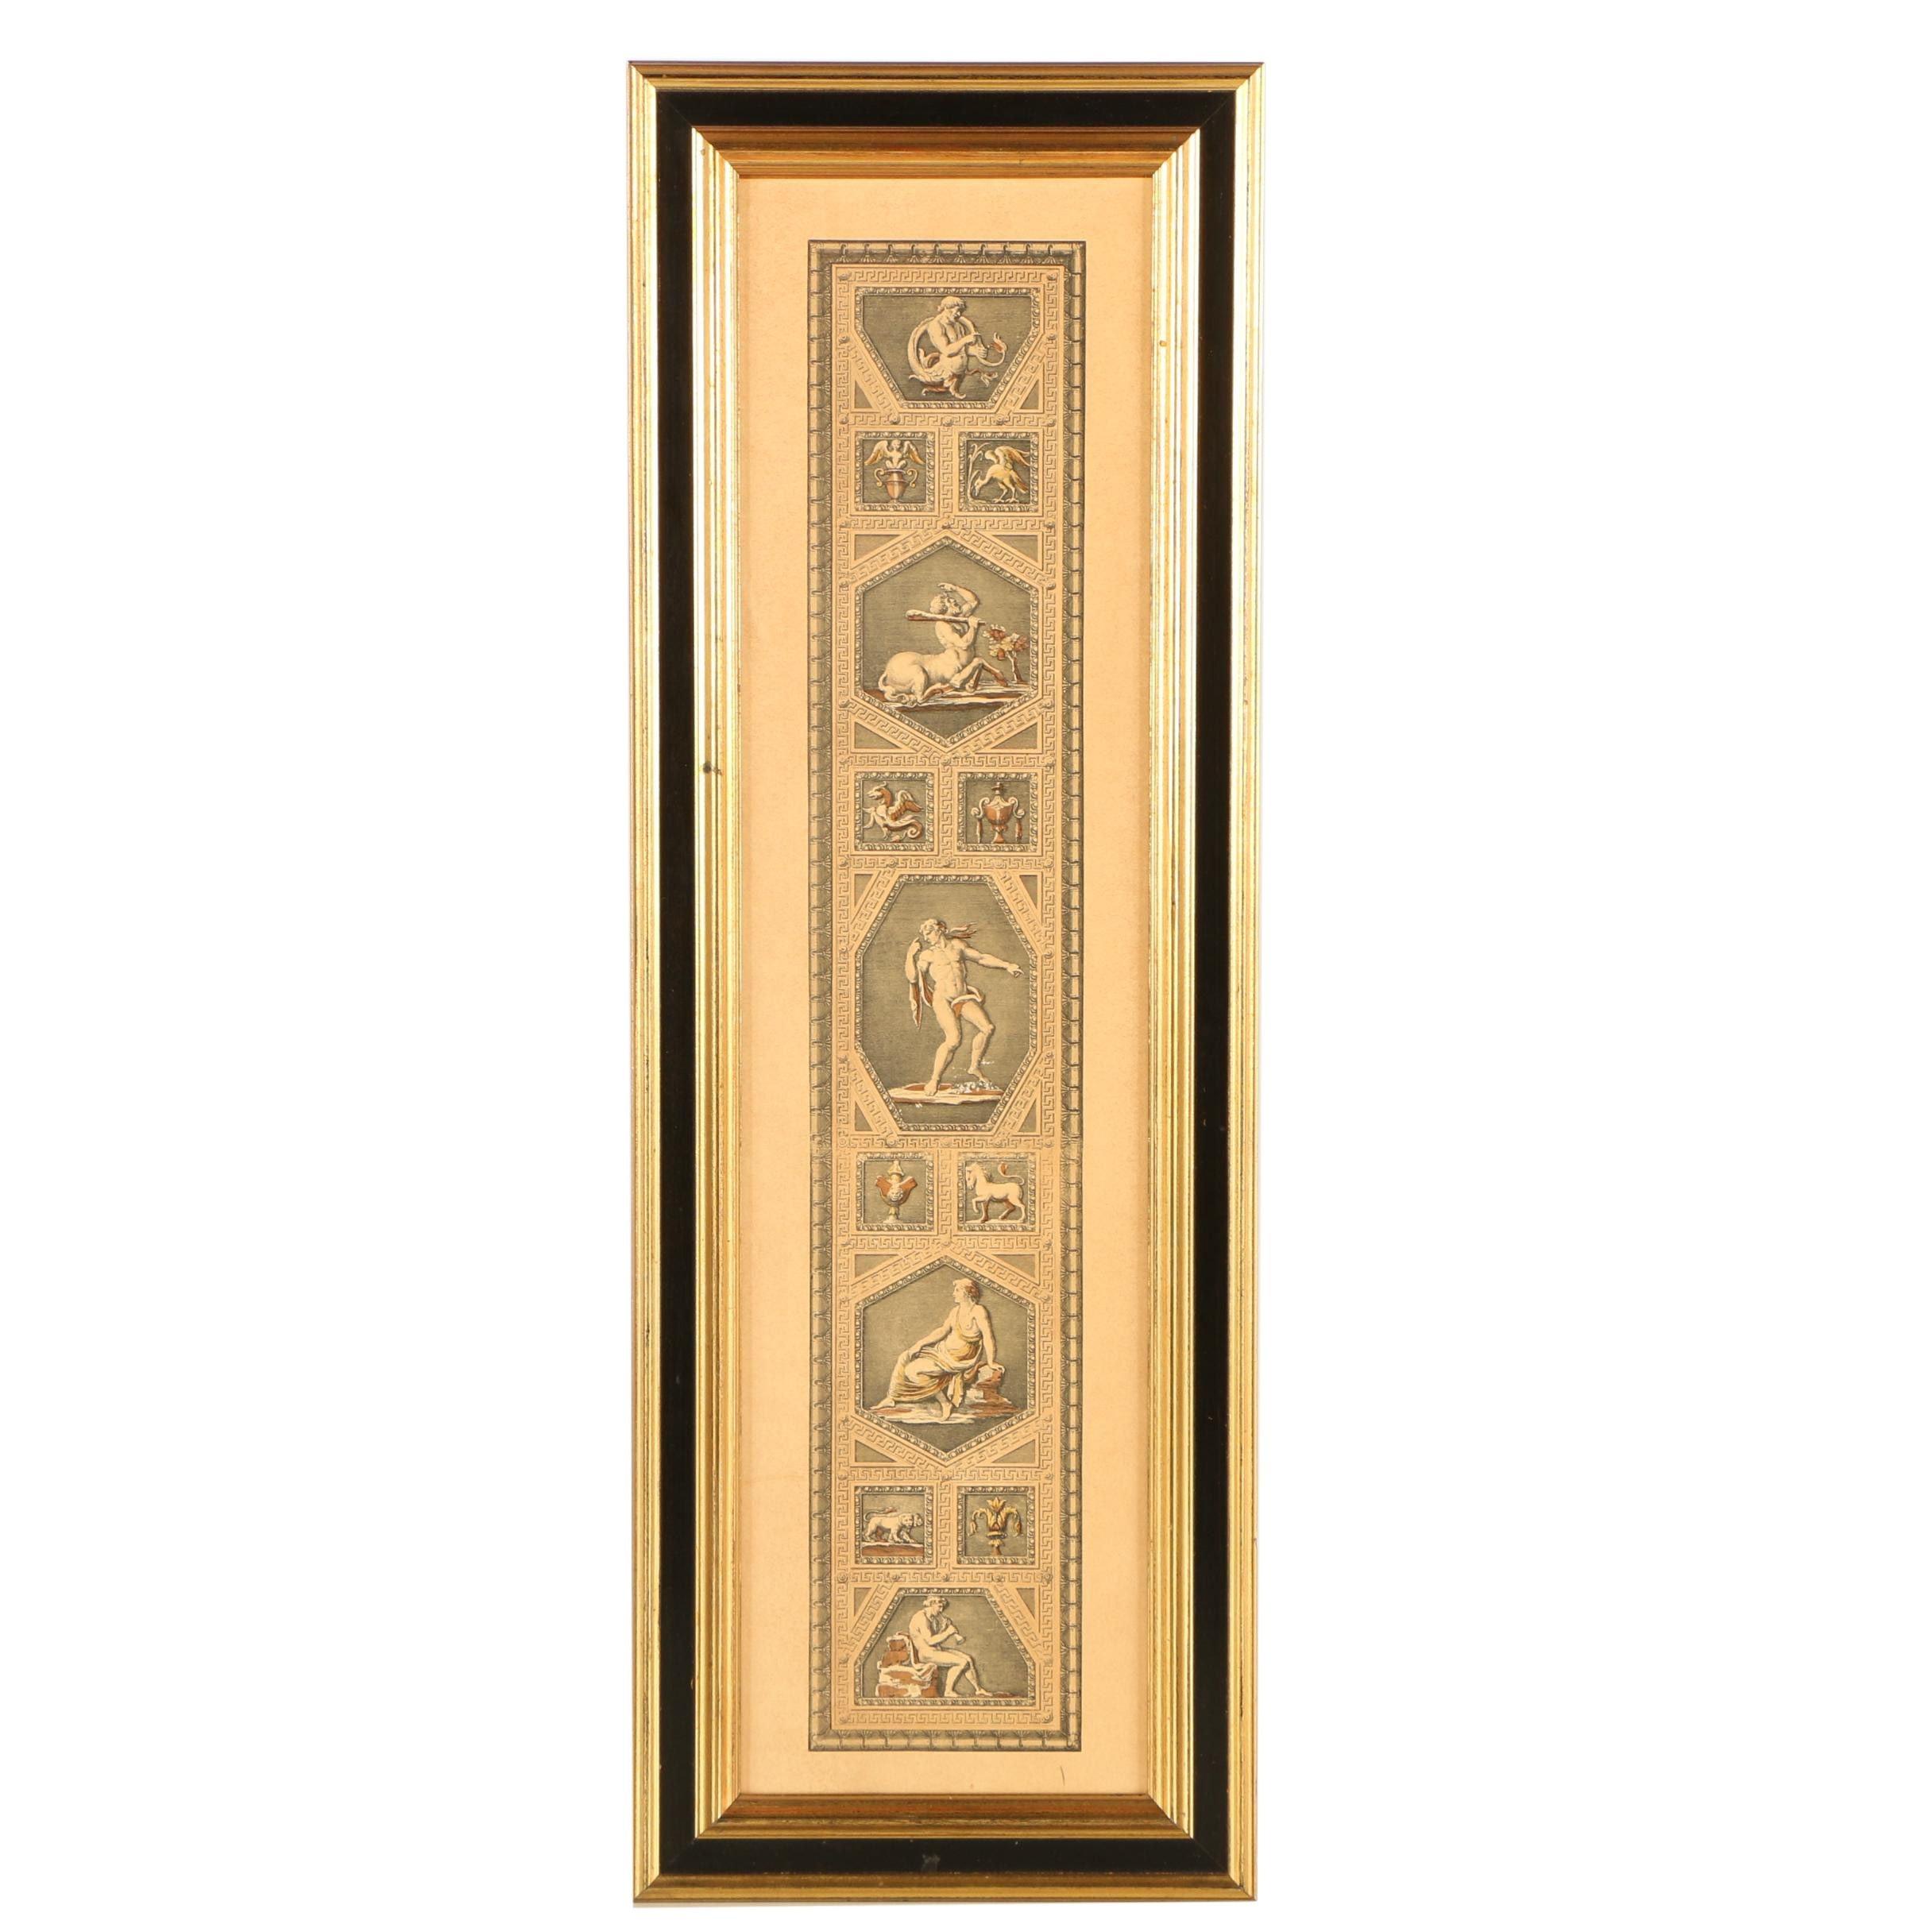 Halftone Print of Greco-Roman Imagery